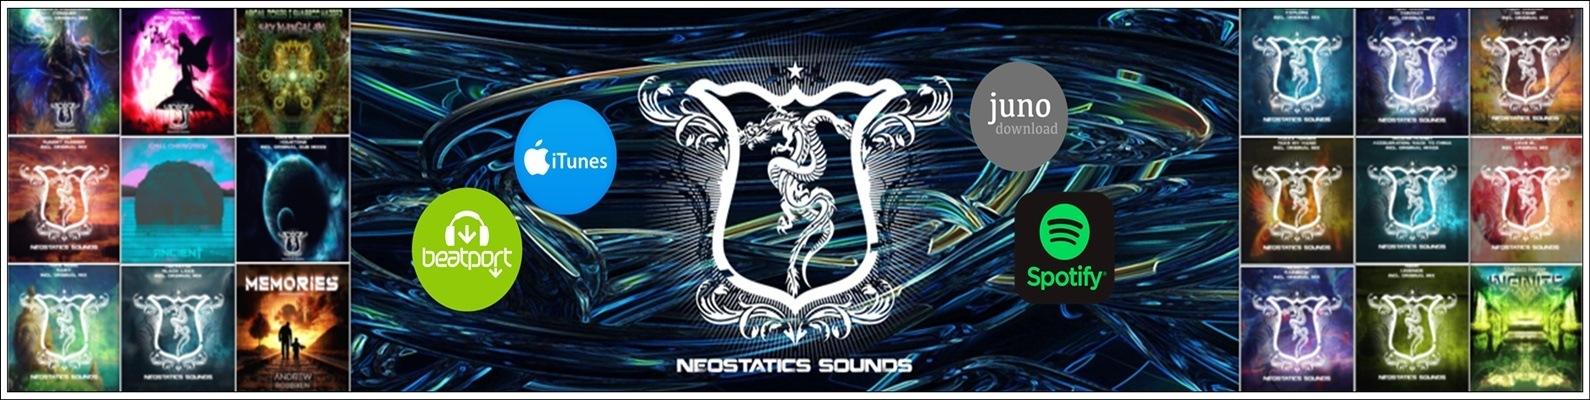 Neostatics Sounds   VK